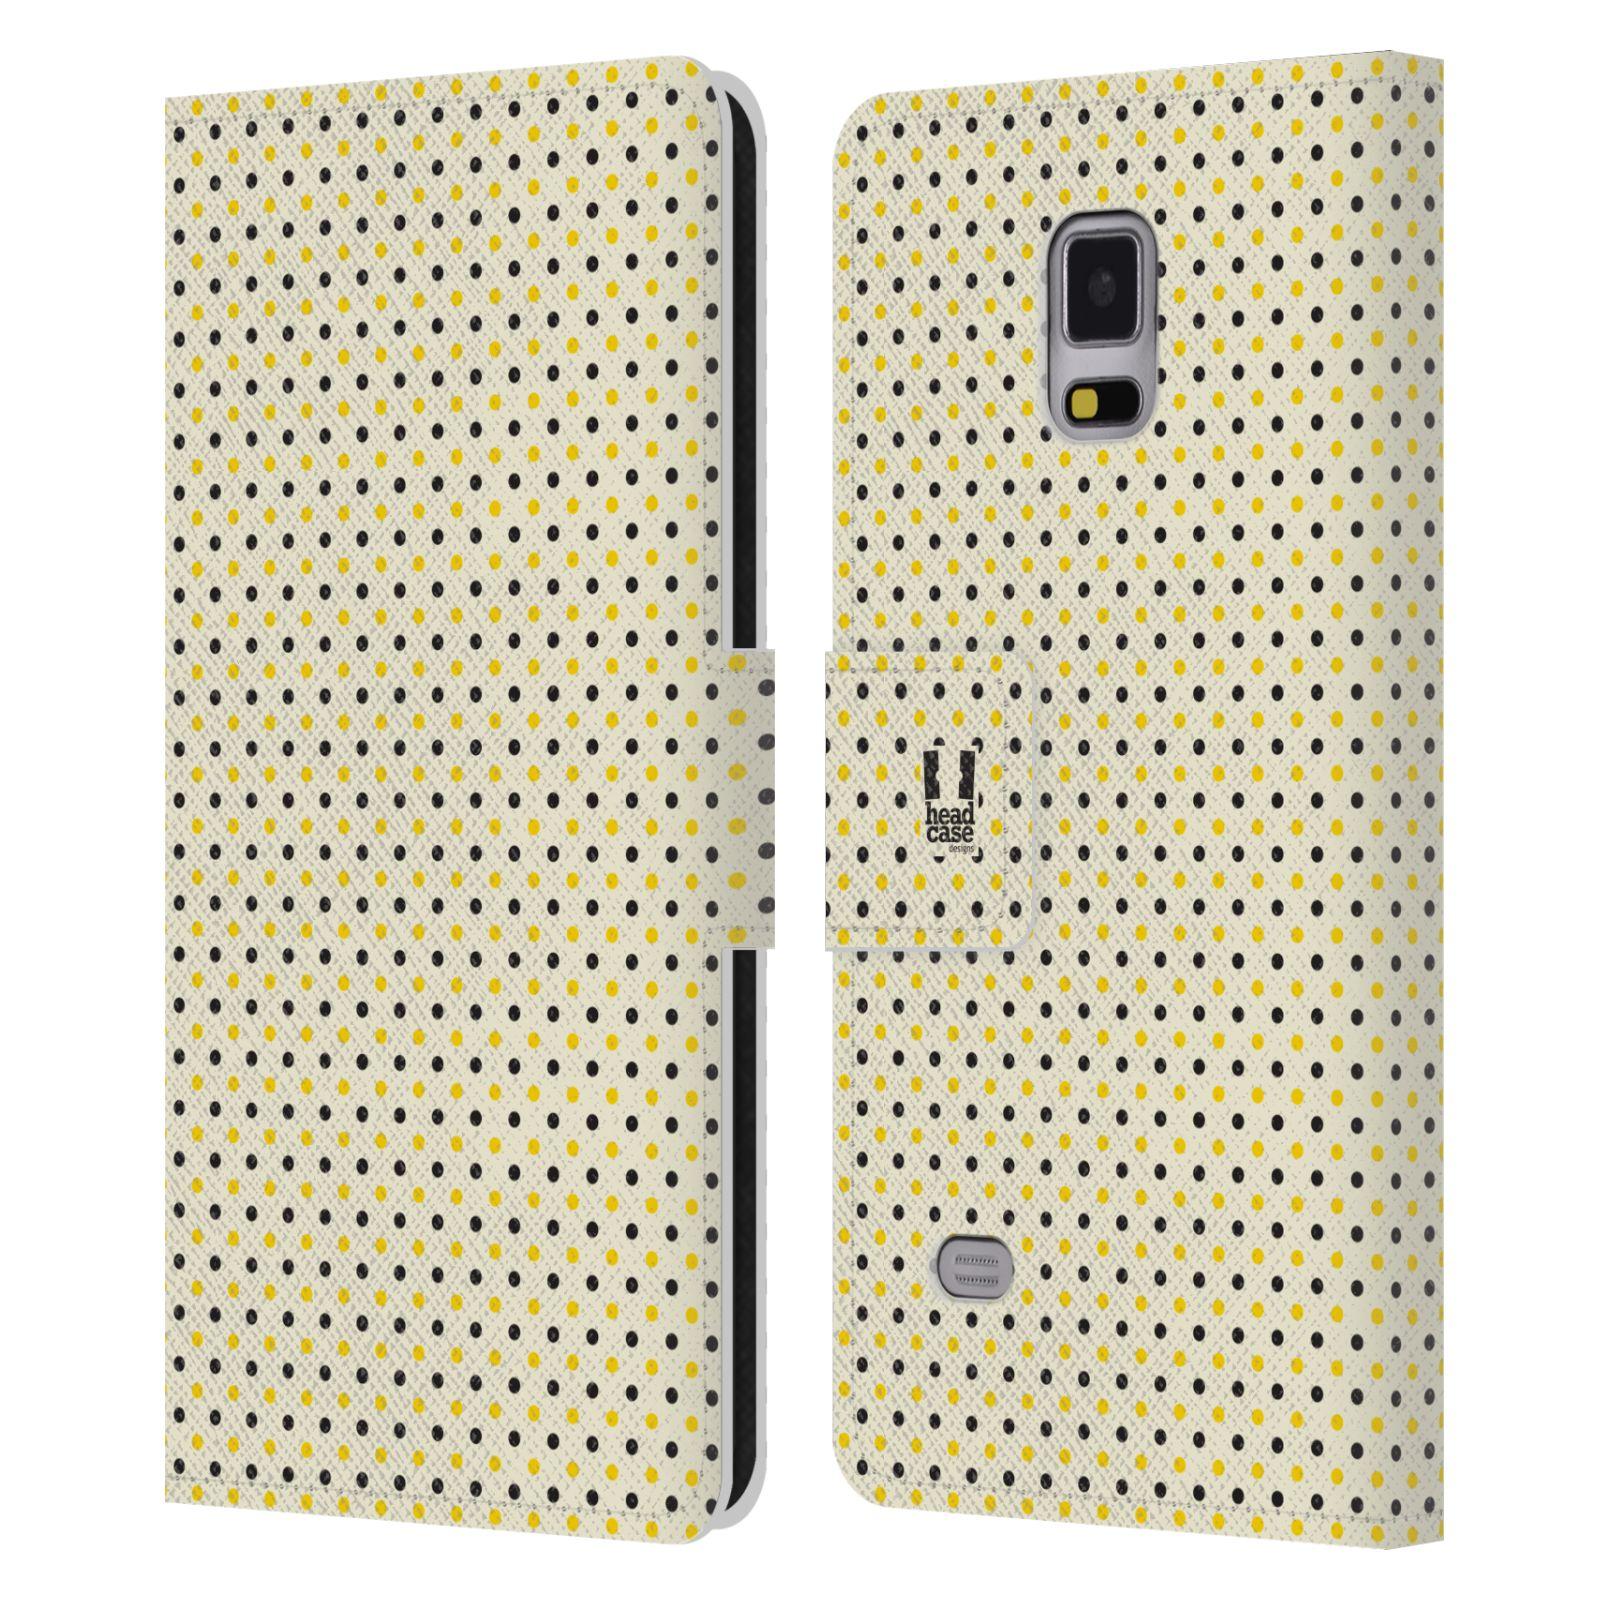 HEAD CASE Flipové pouzdro pro mobil Samsung Galaxy Note 4 VČELÍ VZOR tečky a puntíky